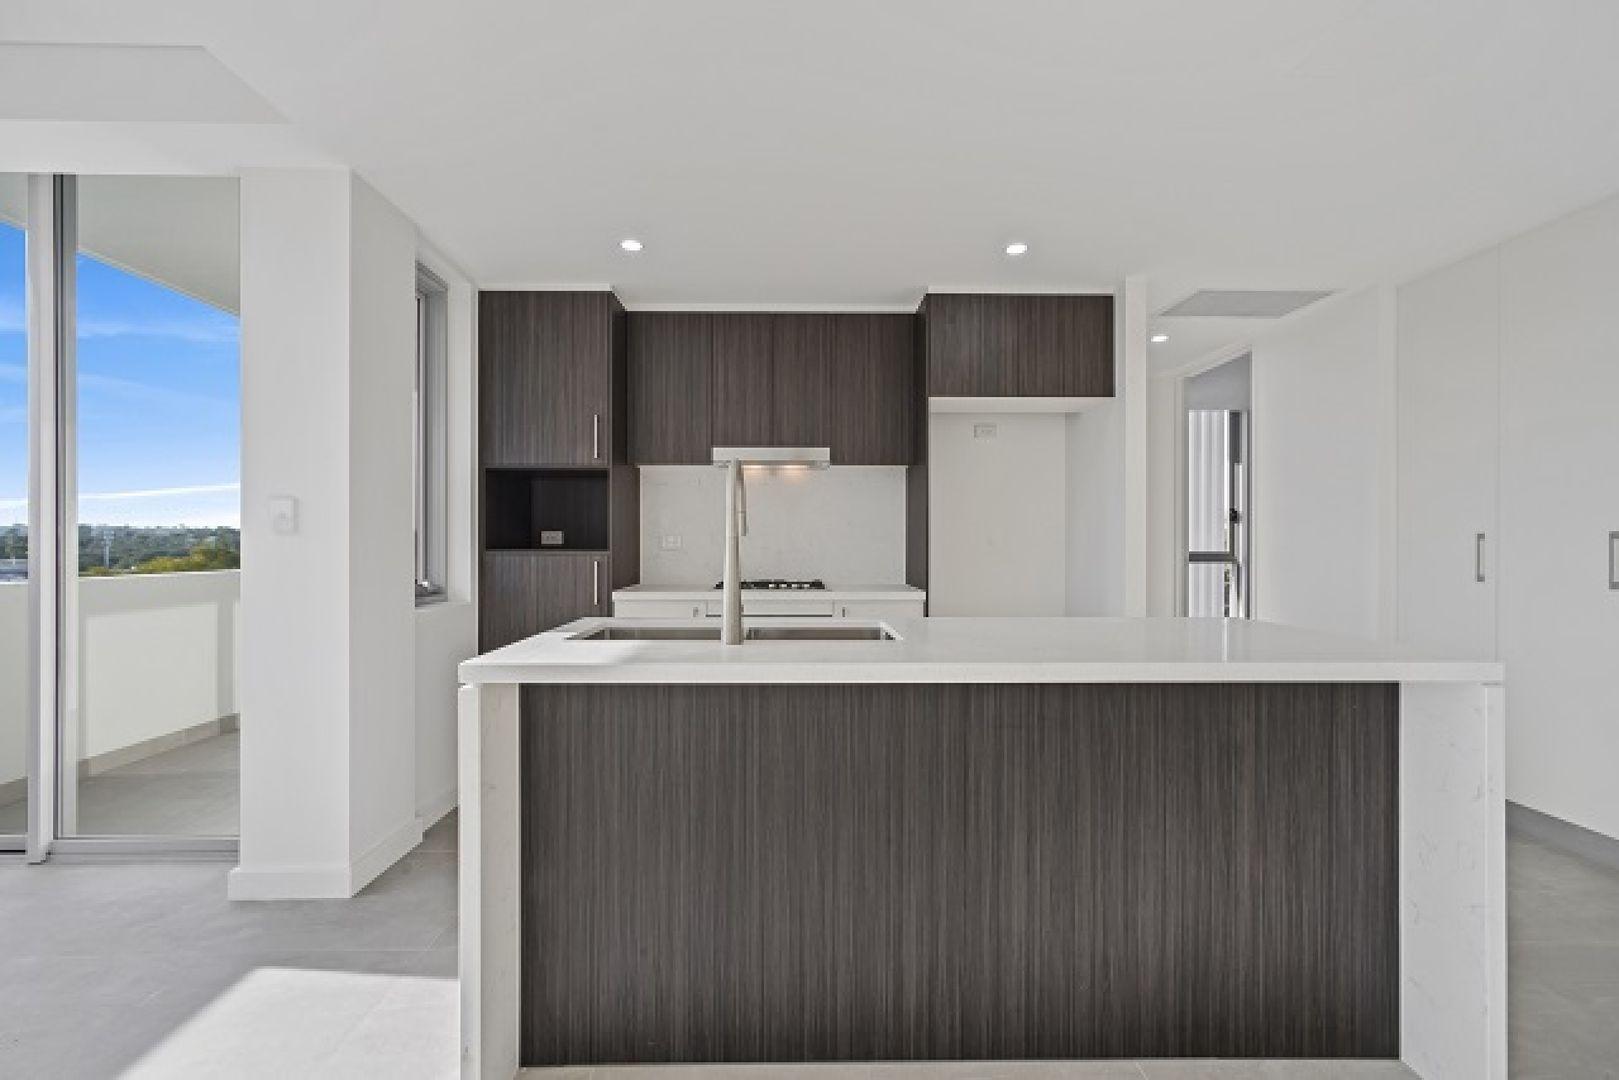 204/8 Monash Road, Gladesville NSW 2111, Image 1